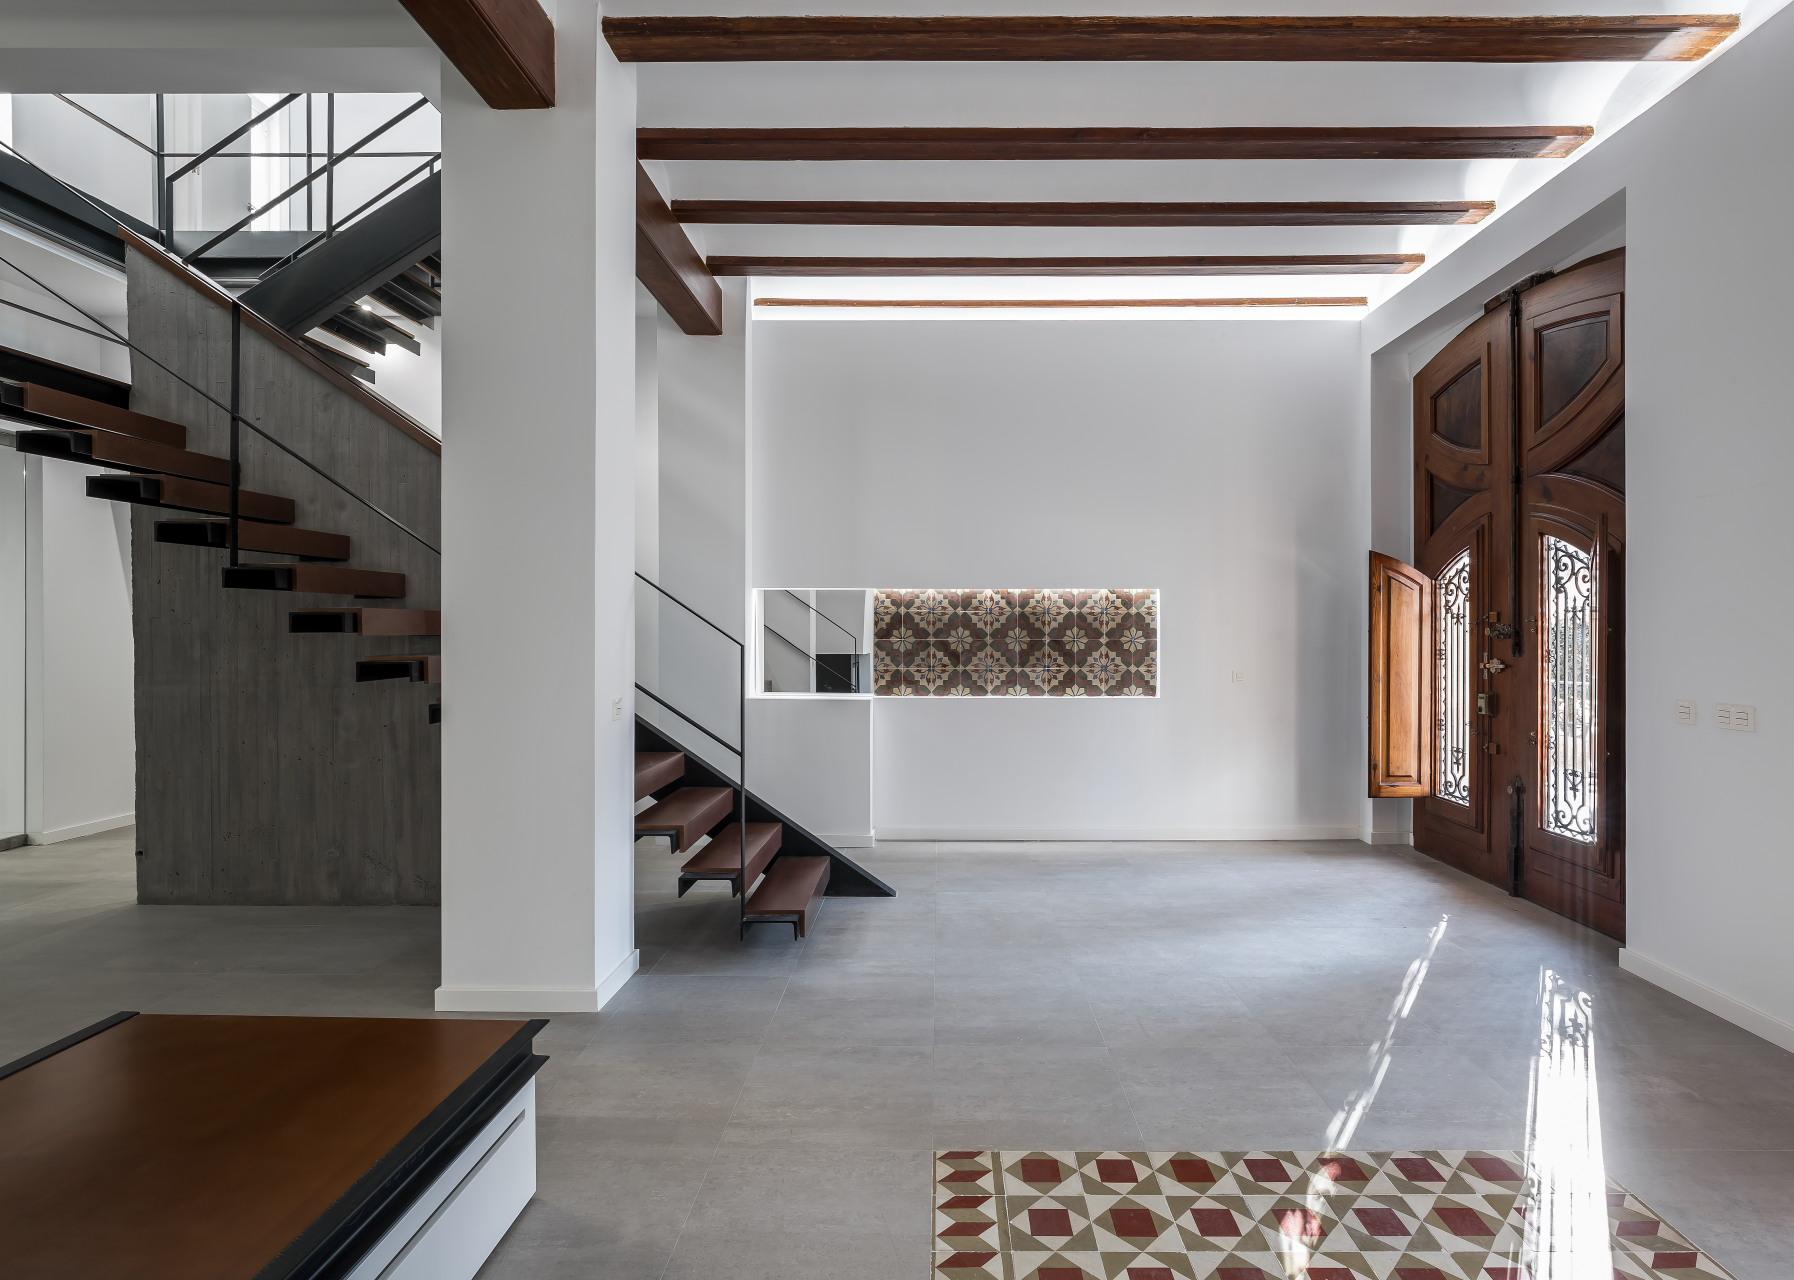 fotografia-arquitectura-valencia-german-cabo-viraje-rehabilitacion-campanar (6)